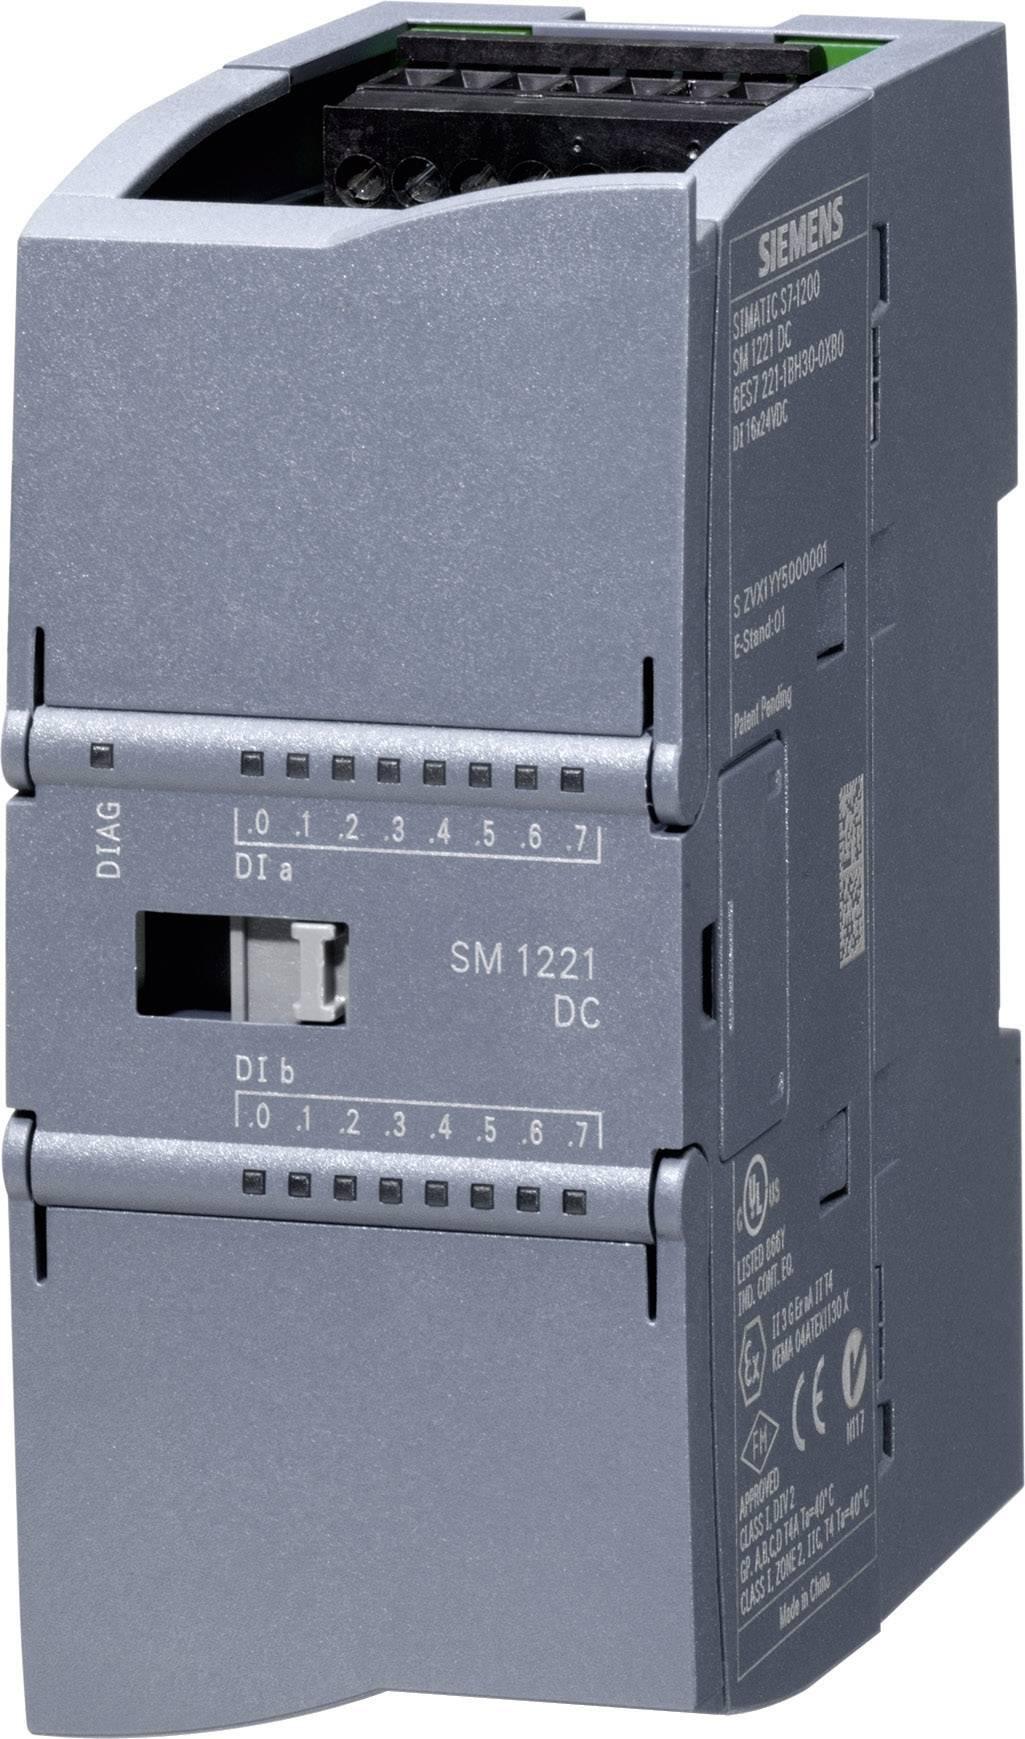 Rozšiřovací PLC modul Siemens SM 1221 (6ES7221-1BF32-0XB0)